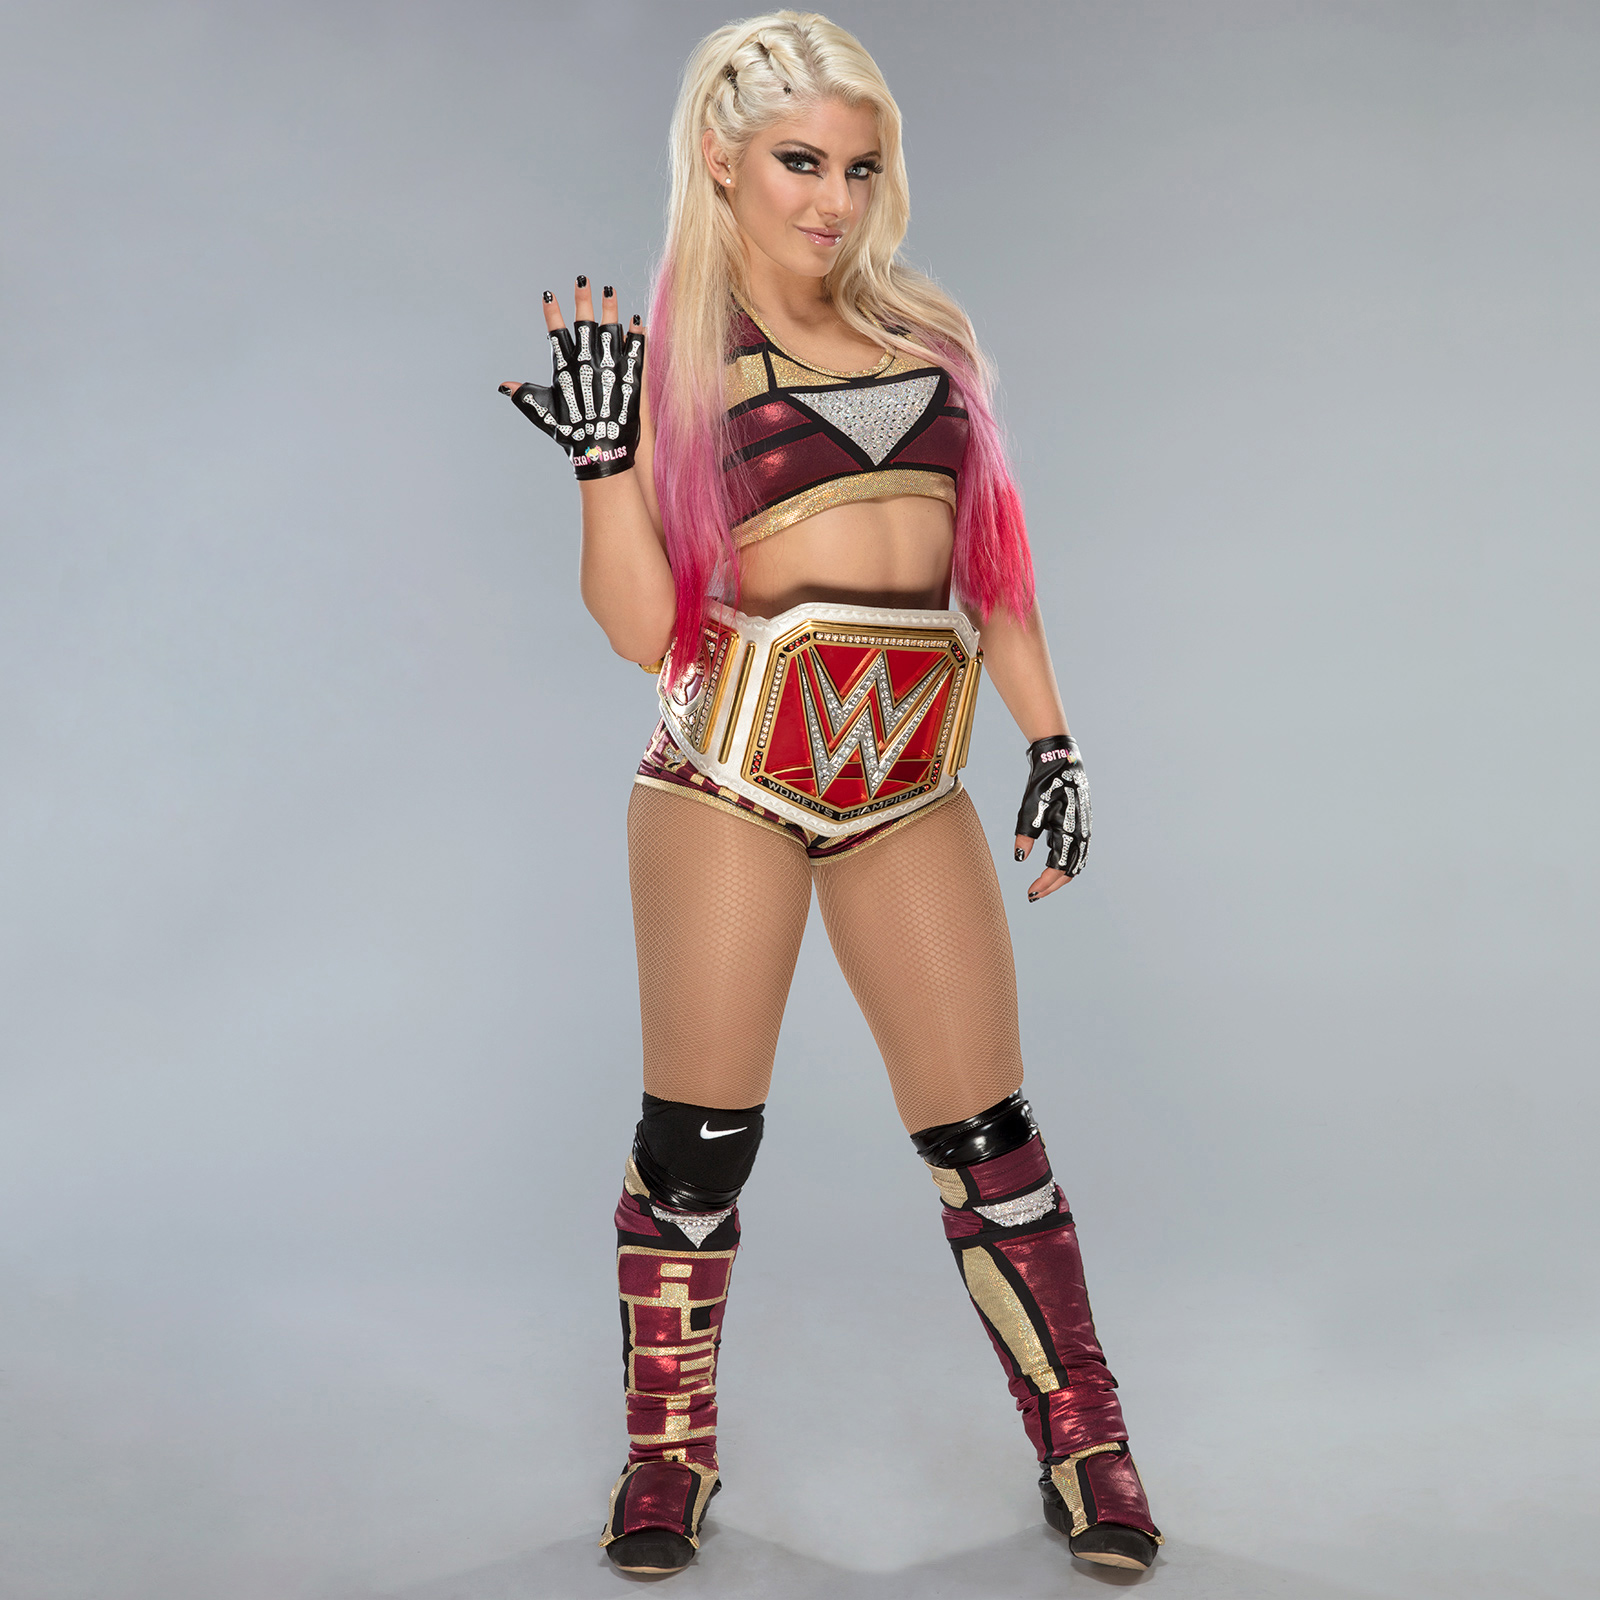 Alexa Bliss 2017 : Alexa Bliss: New Raw Womens Championship -02